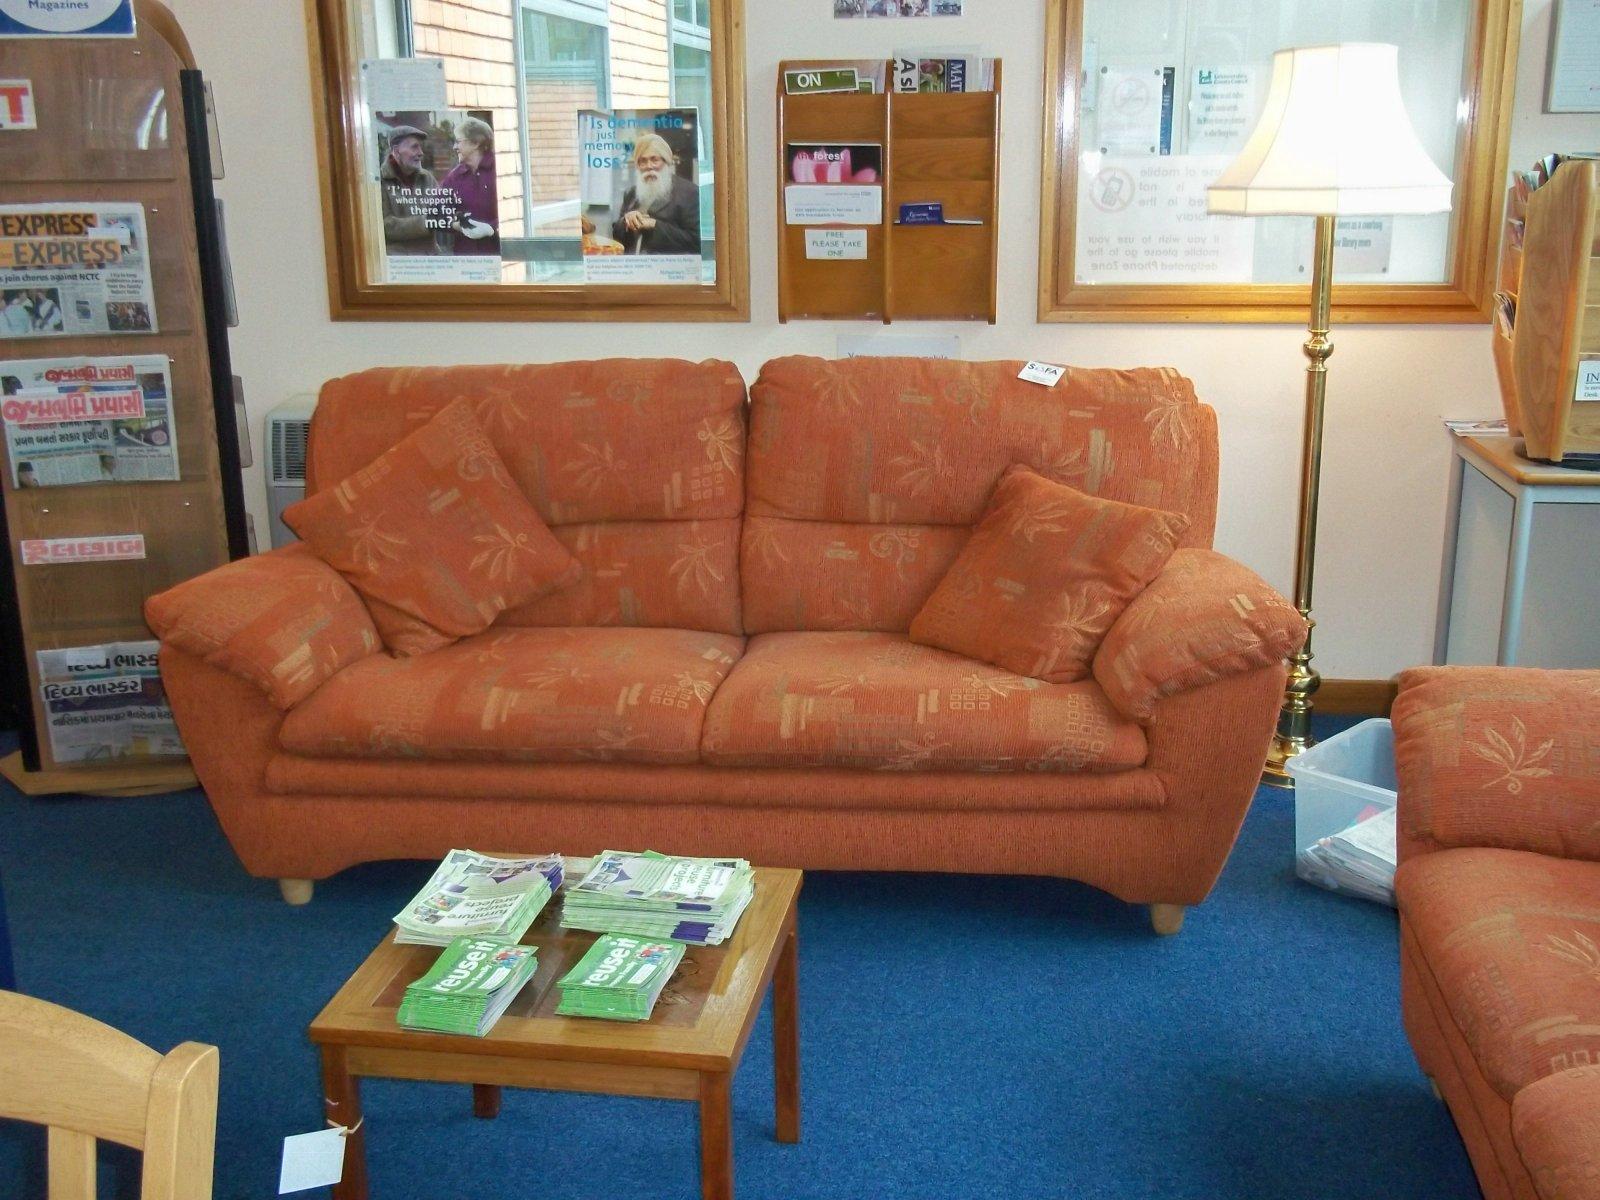 sofa - sofa furniture in loughborough library march 2012 | a sofa